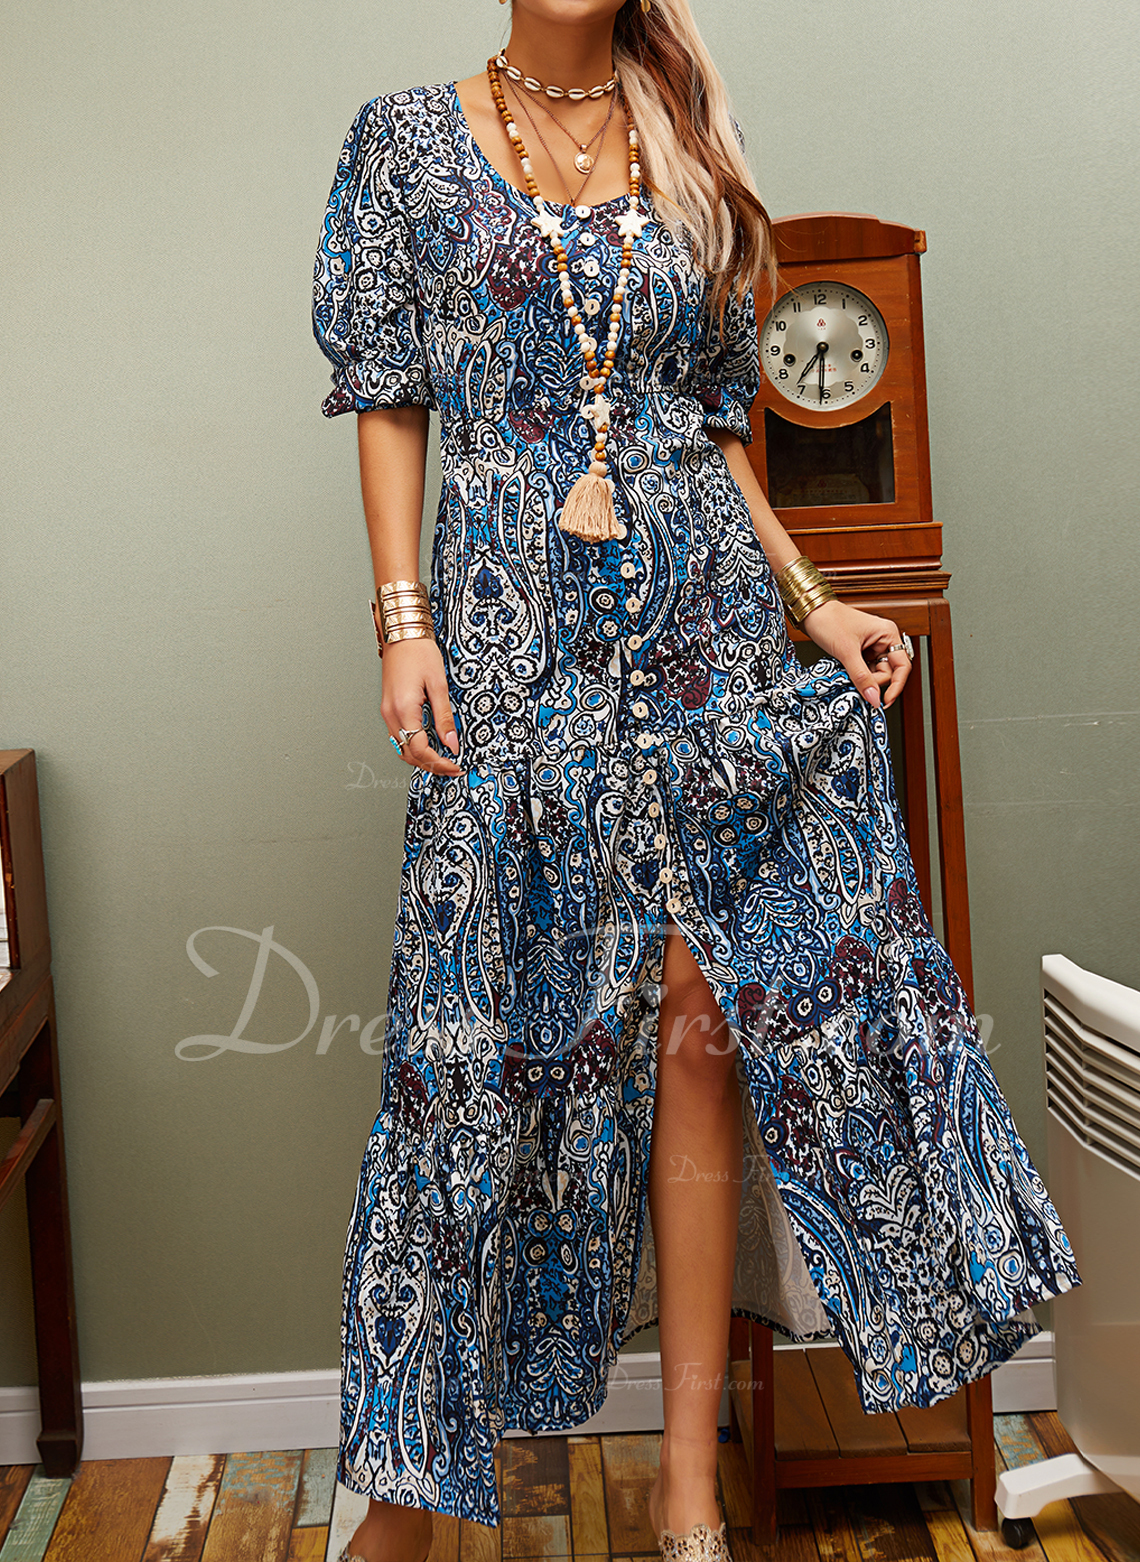 Floral Print Shift 3/4 Sleeves Maxi Boho Casual Vacation Dresses